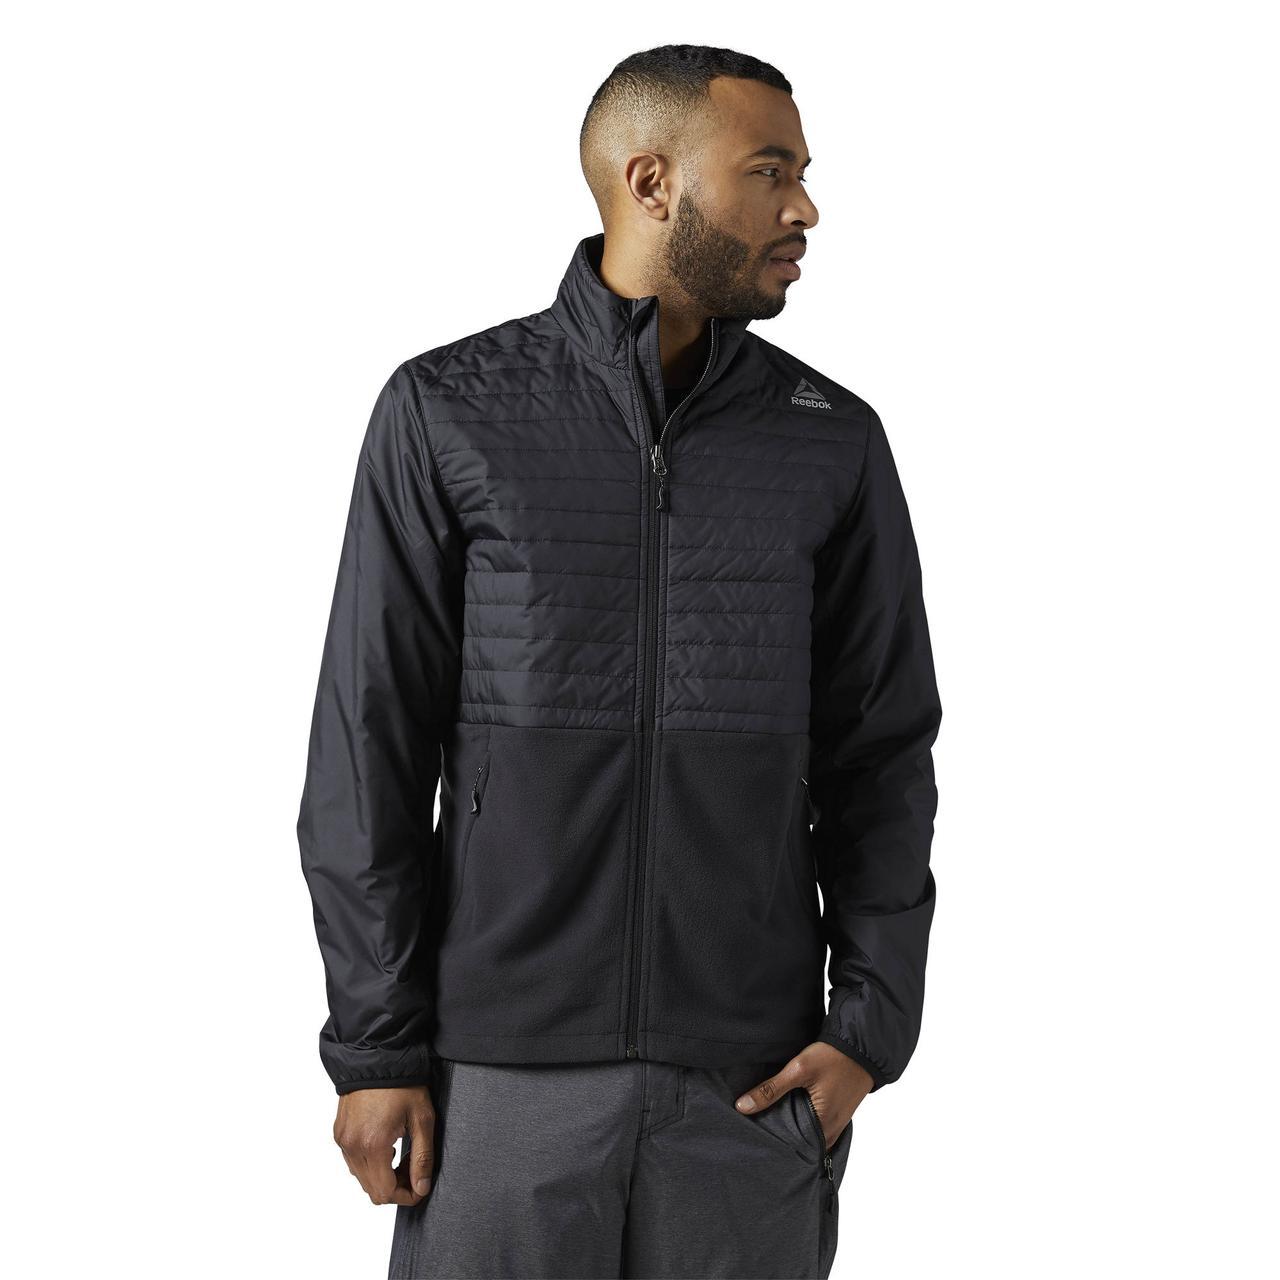 Мужская куртка Reebok Outdoor Combed Fleece (Артикул: BR0457)